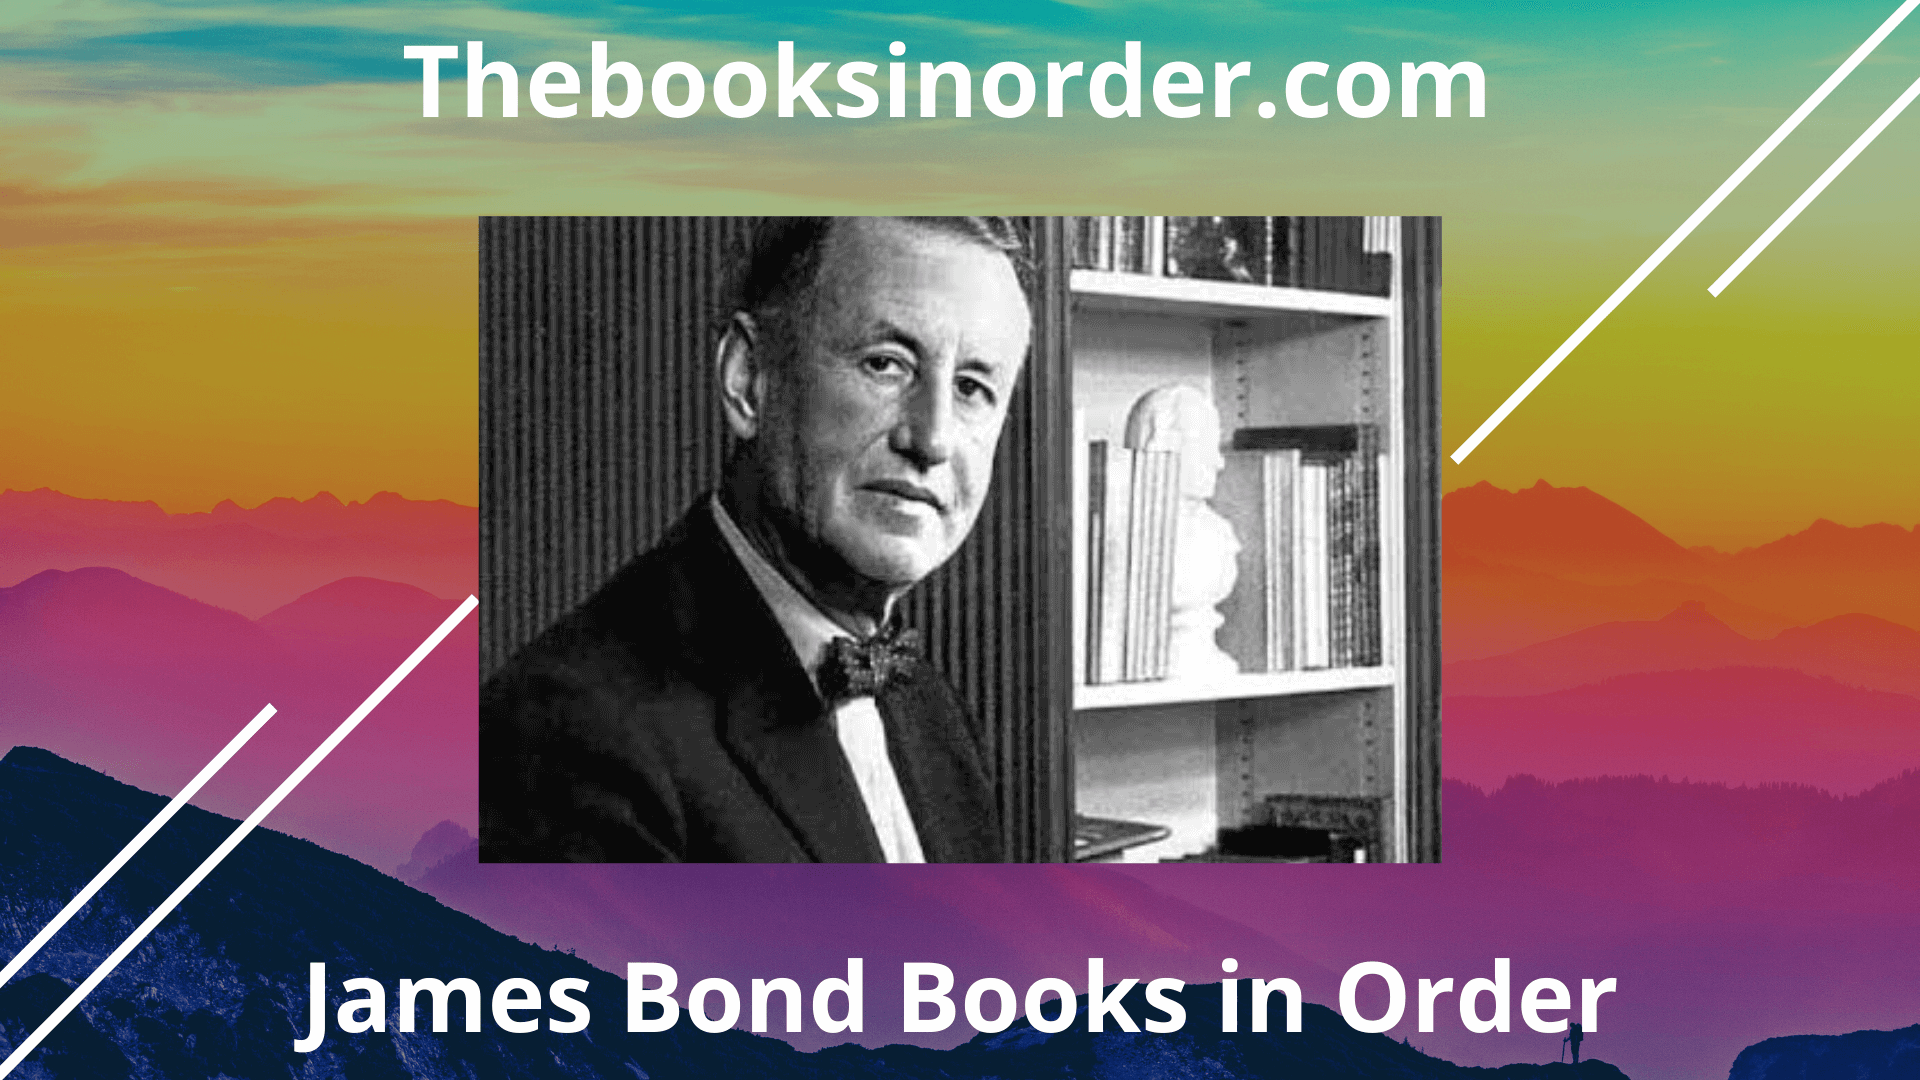 bondbooks, james bond book order, james bond books, james bond books in order, james bond novels